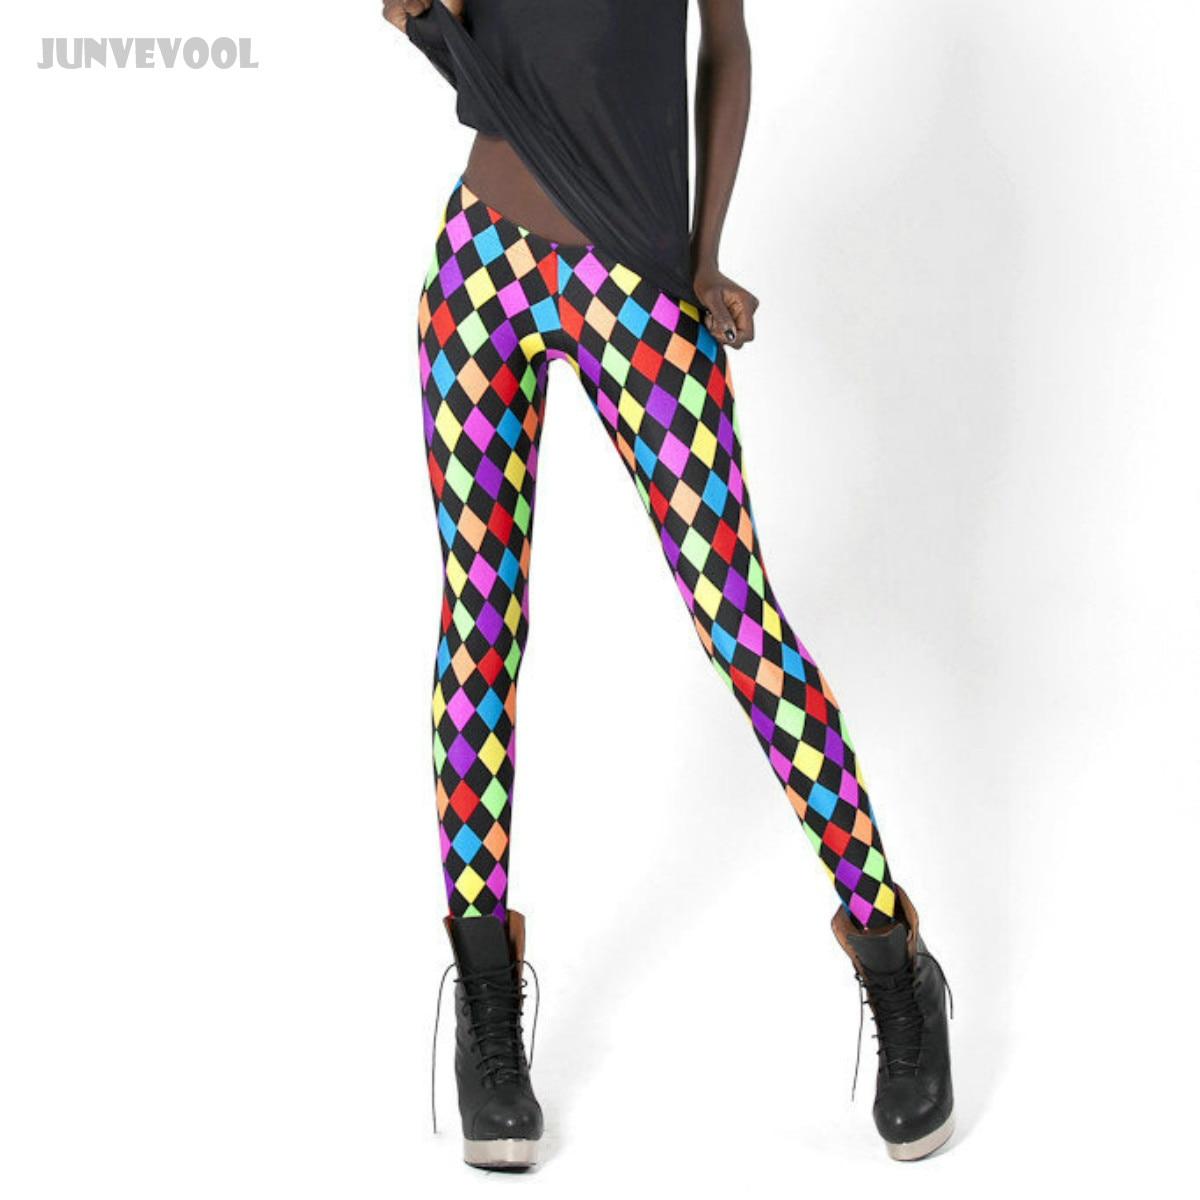 Leggings   Rainbow Color Spandex Fashion Rhombus Printed New Lady Women Sexy Stretch Skinny Pants Slim Trousers Black Joggings Hot